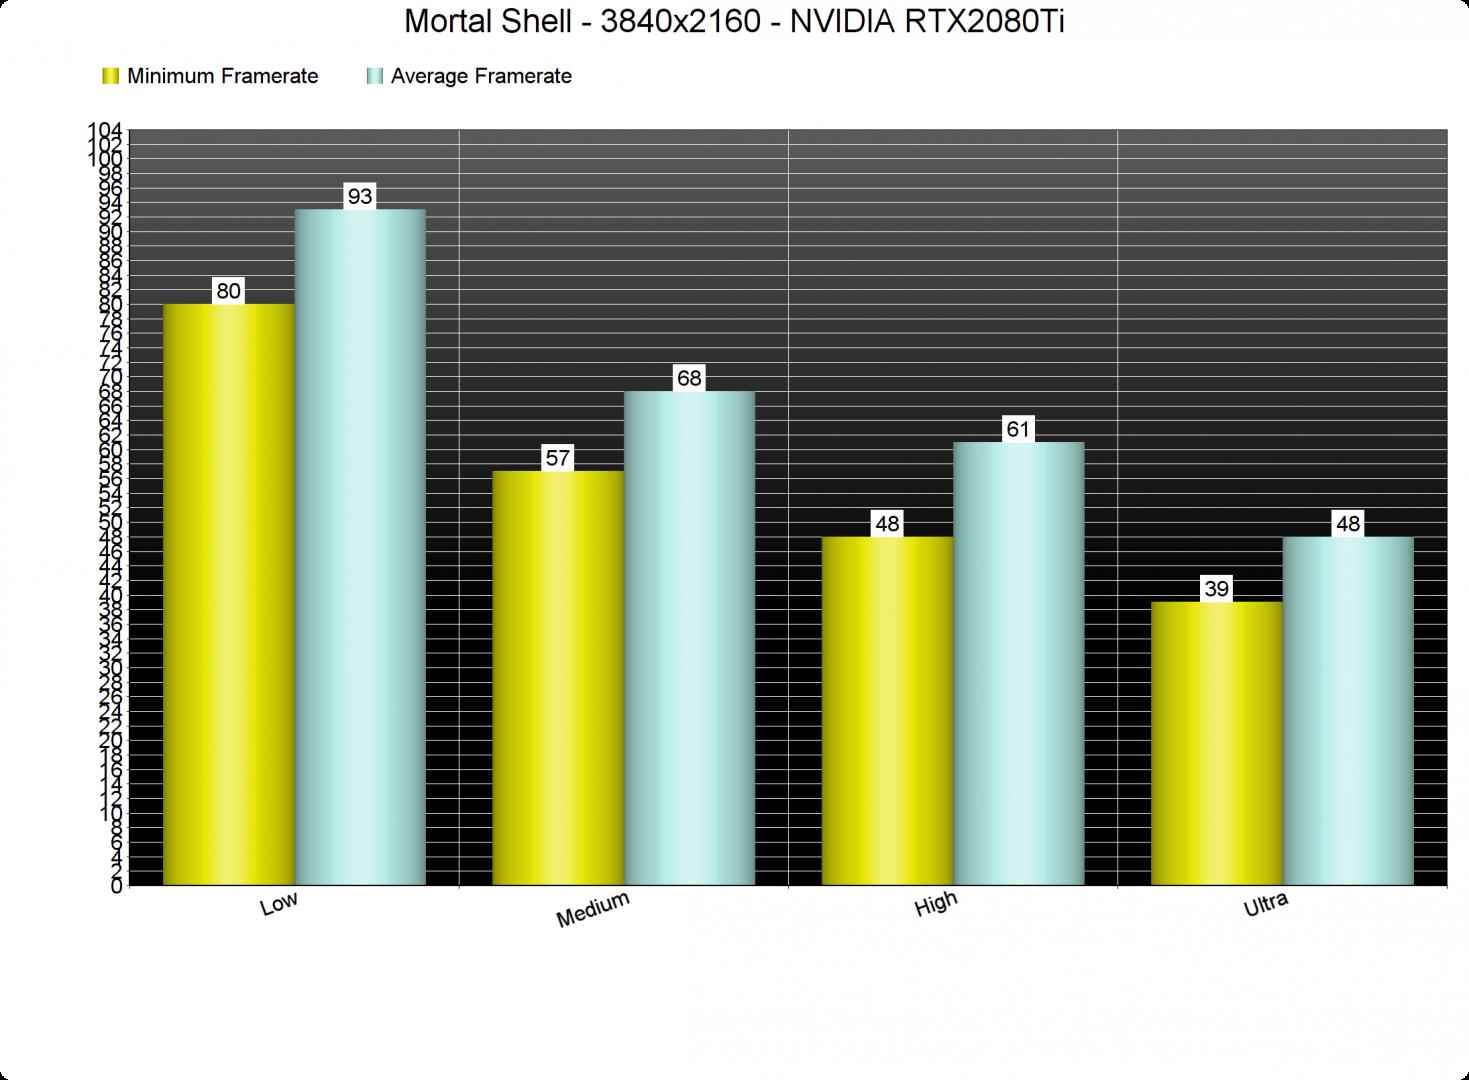 Mortal Shell PC Settings benchmarks